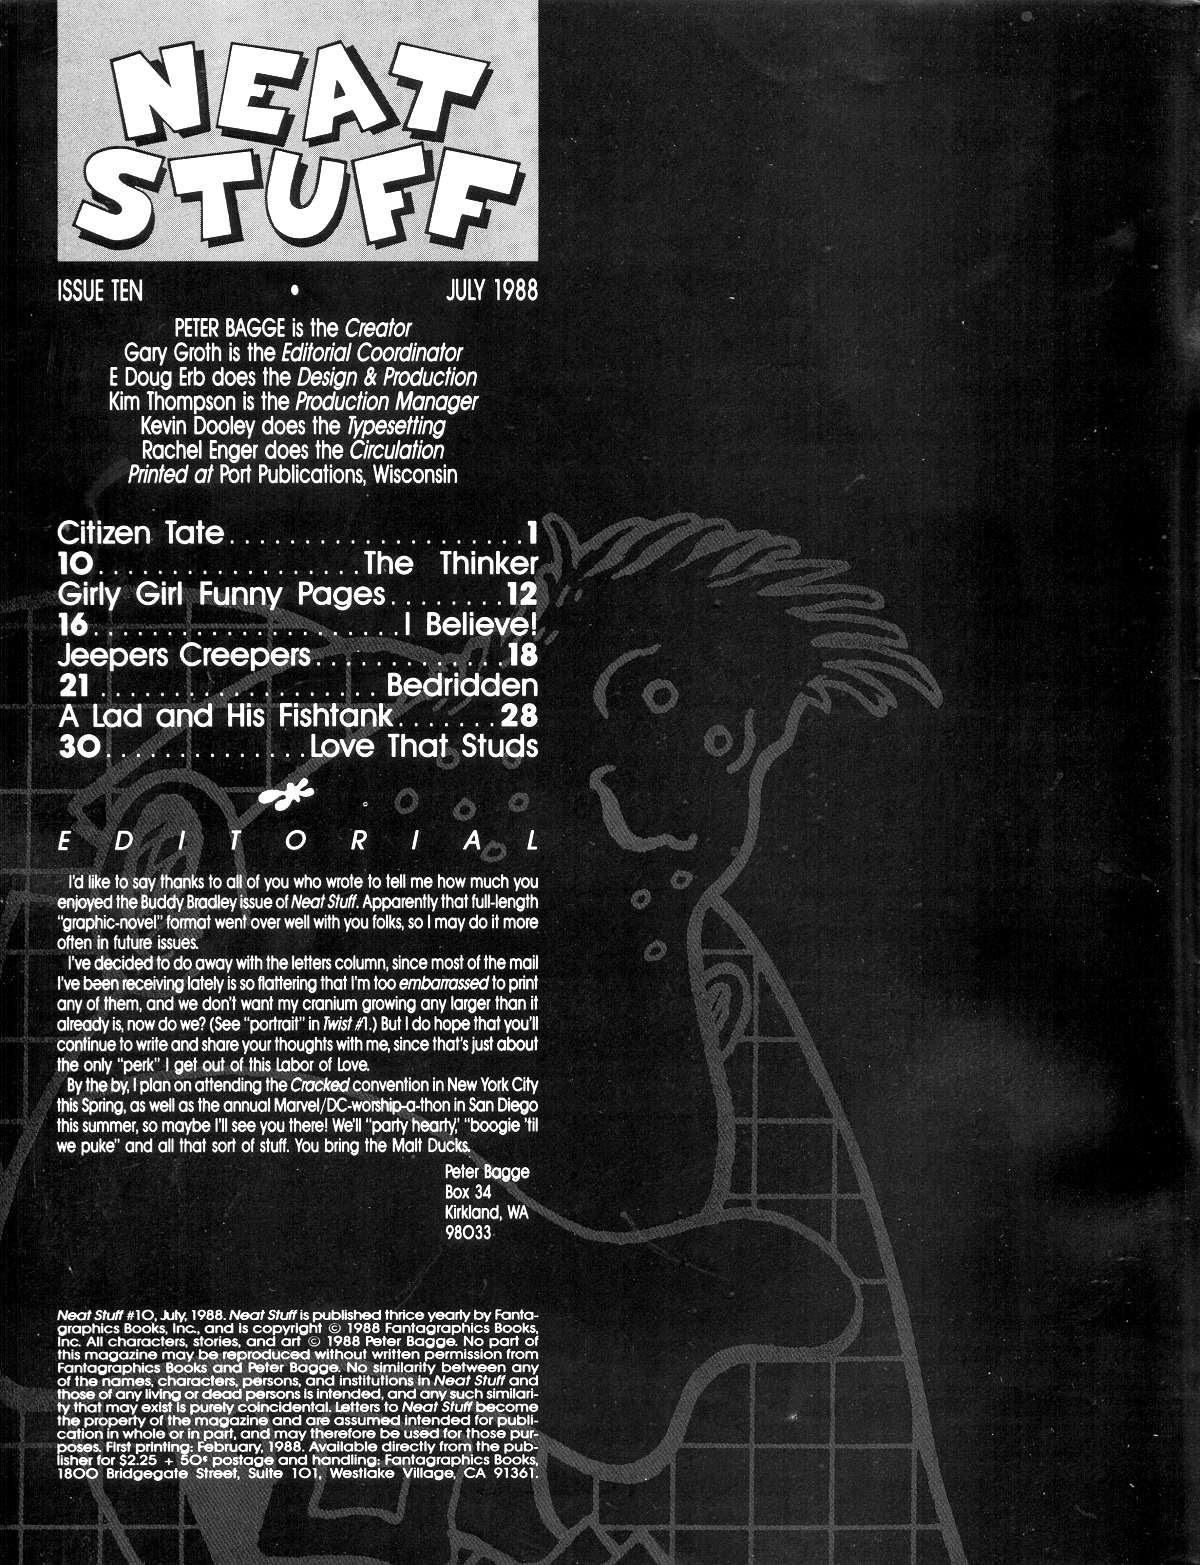 Read online Neat Stuff comic -  Issue #10 - 2